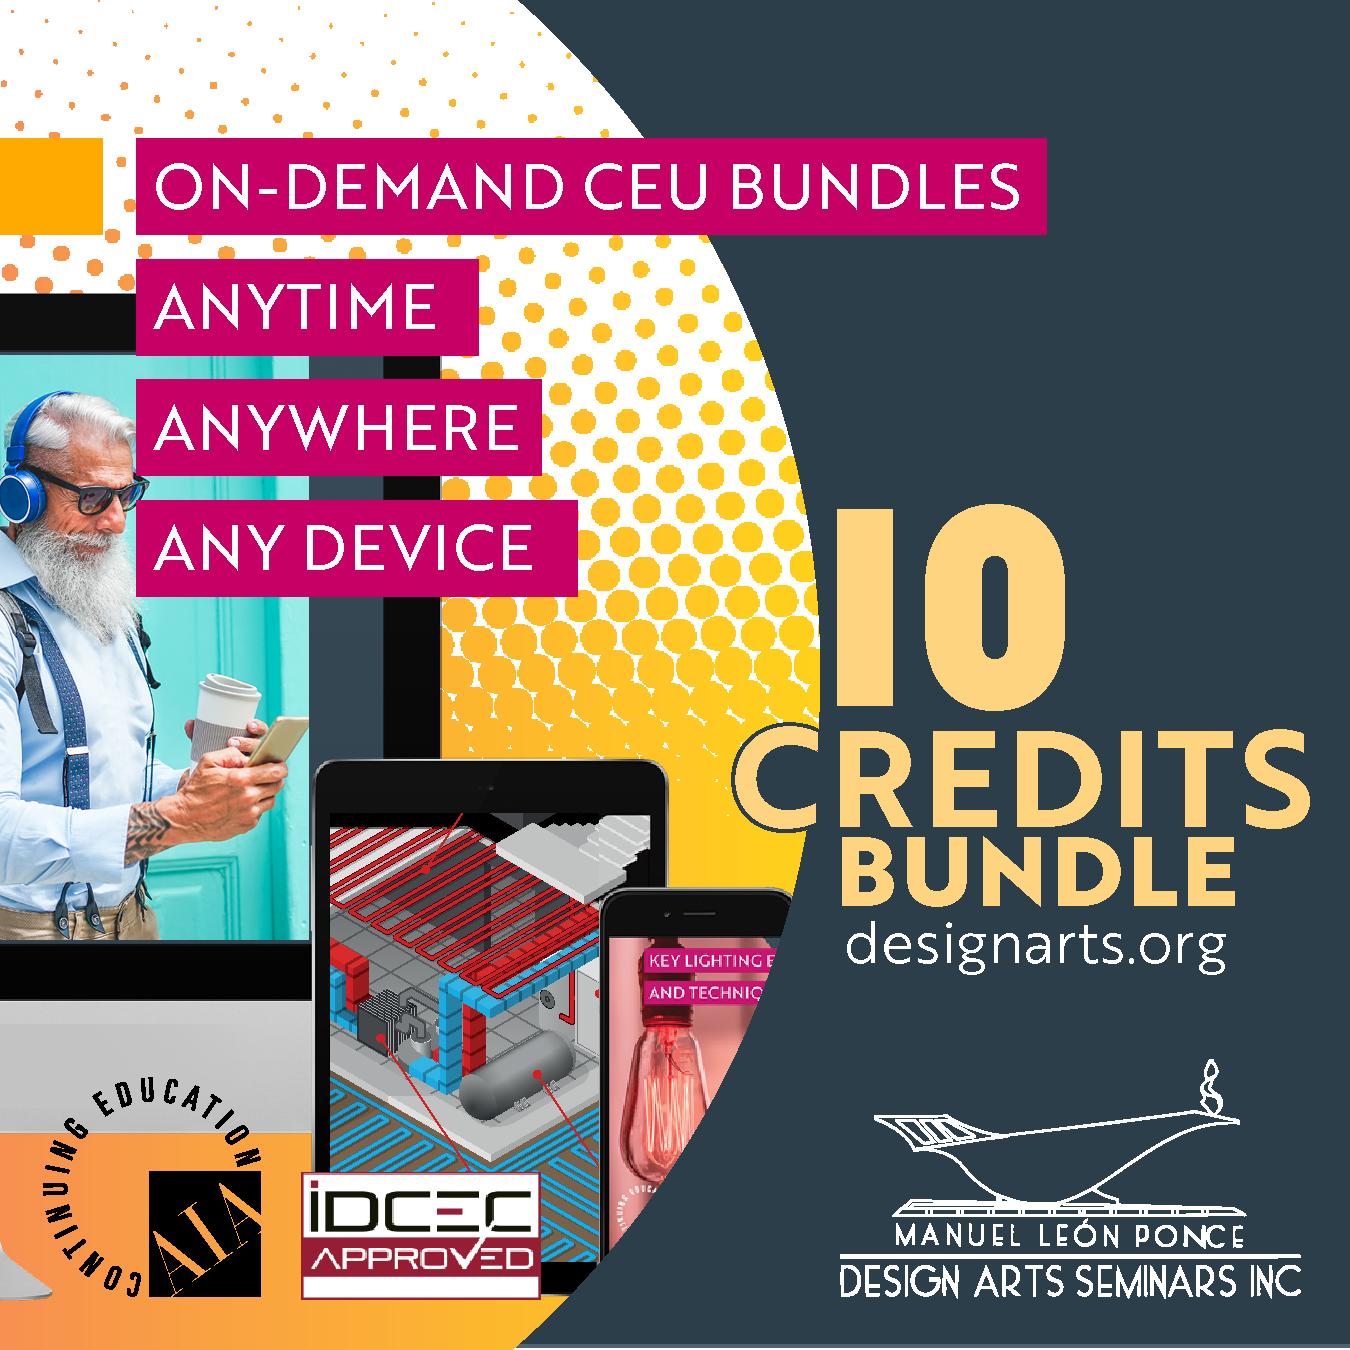 10-CREDIT ON-DEMAND WEBINAR BUNDLE